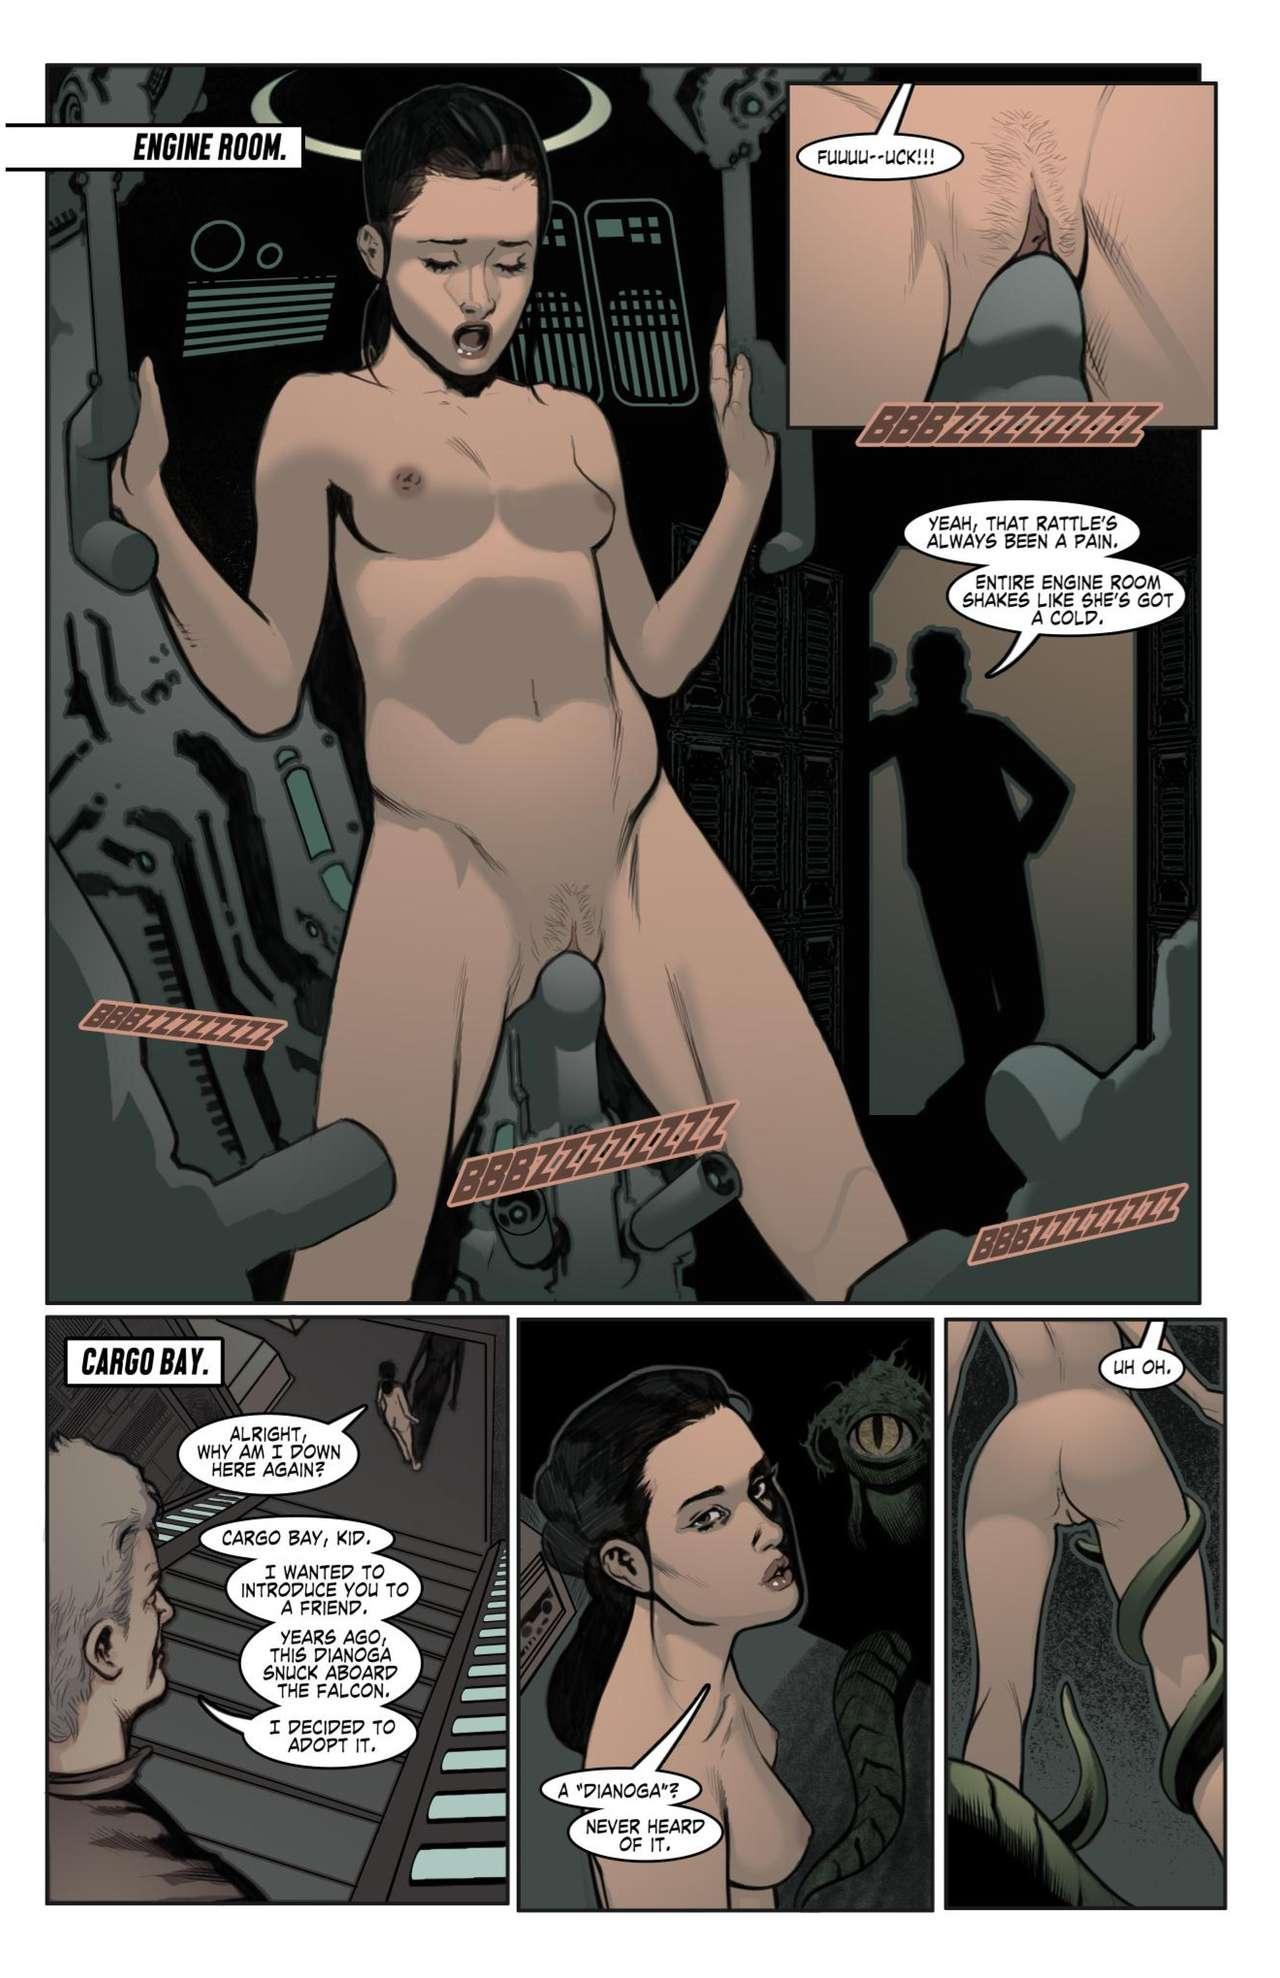 wars the awakens star force naked Xxx 1 boy 1 girl